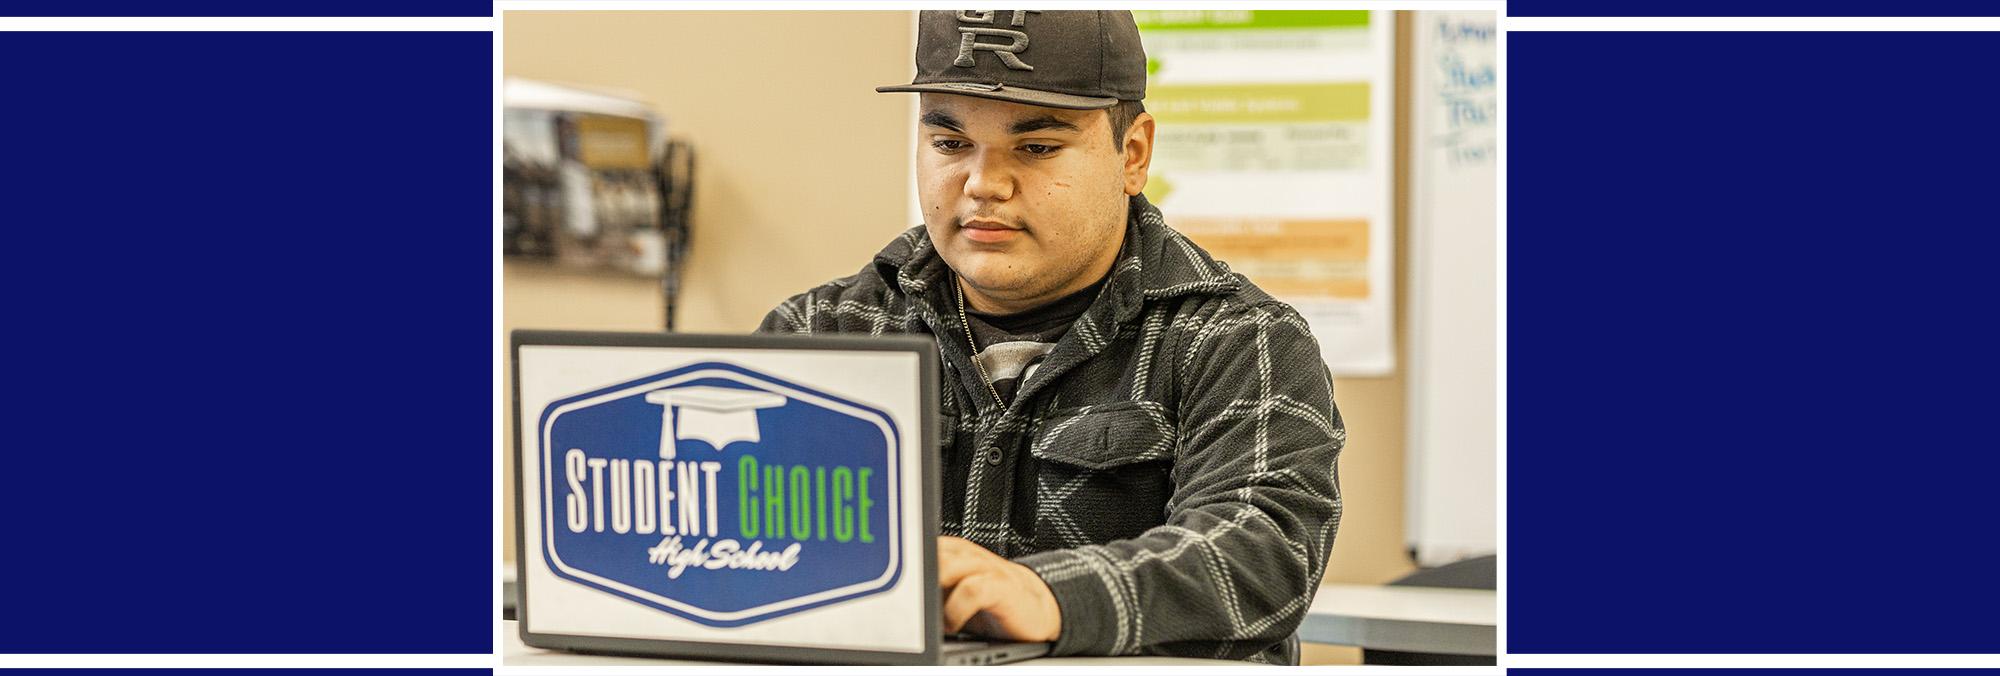 Student Choice wall display